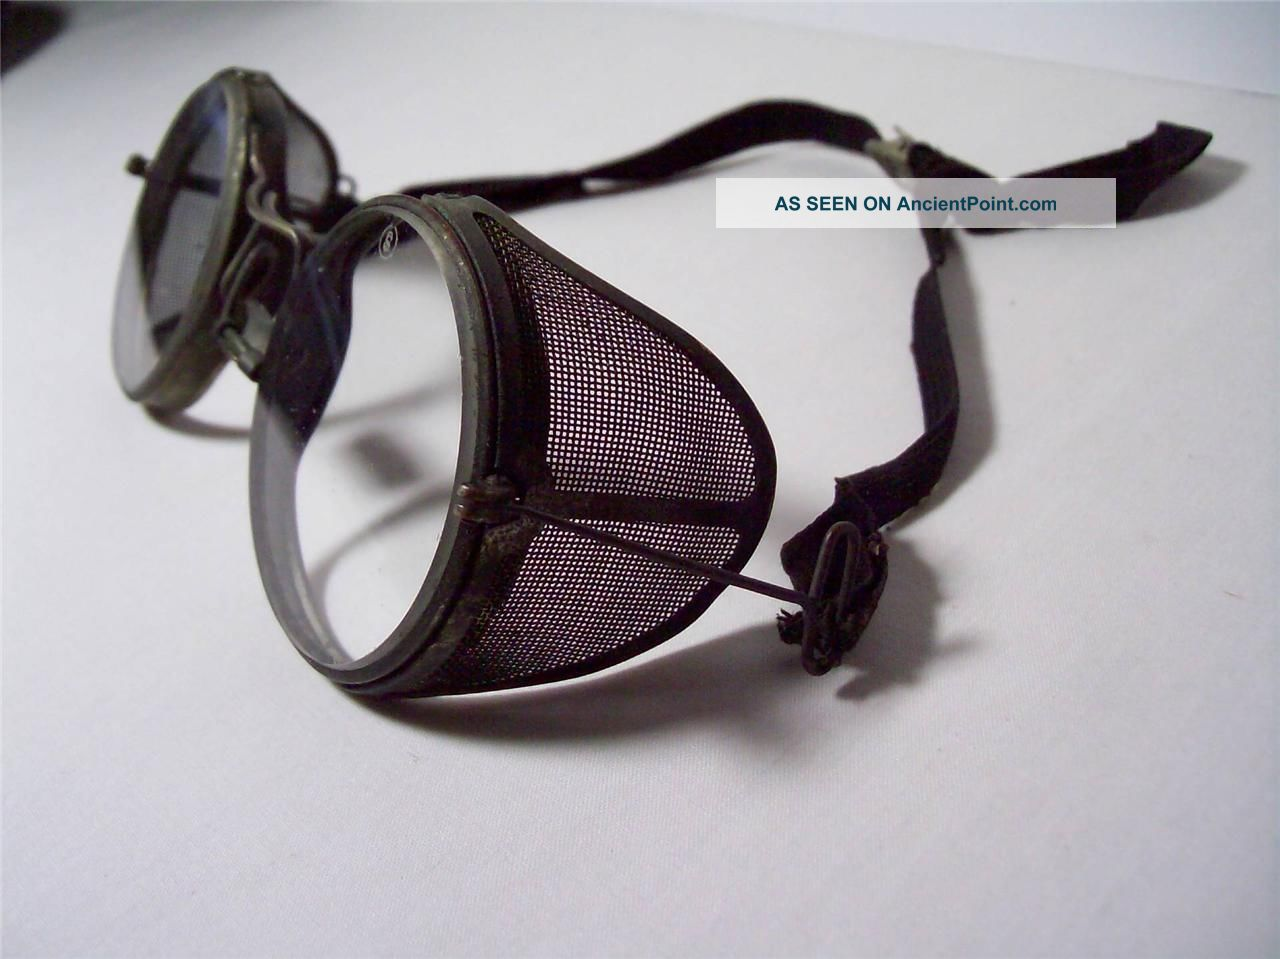 0da0d6fb018 Prescription Safety Glasses With Mesh Side Shields - Bitterroot ...